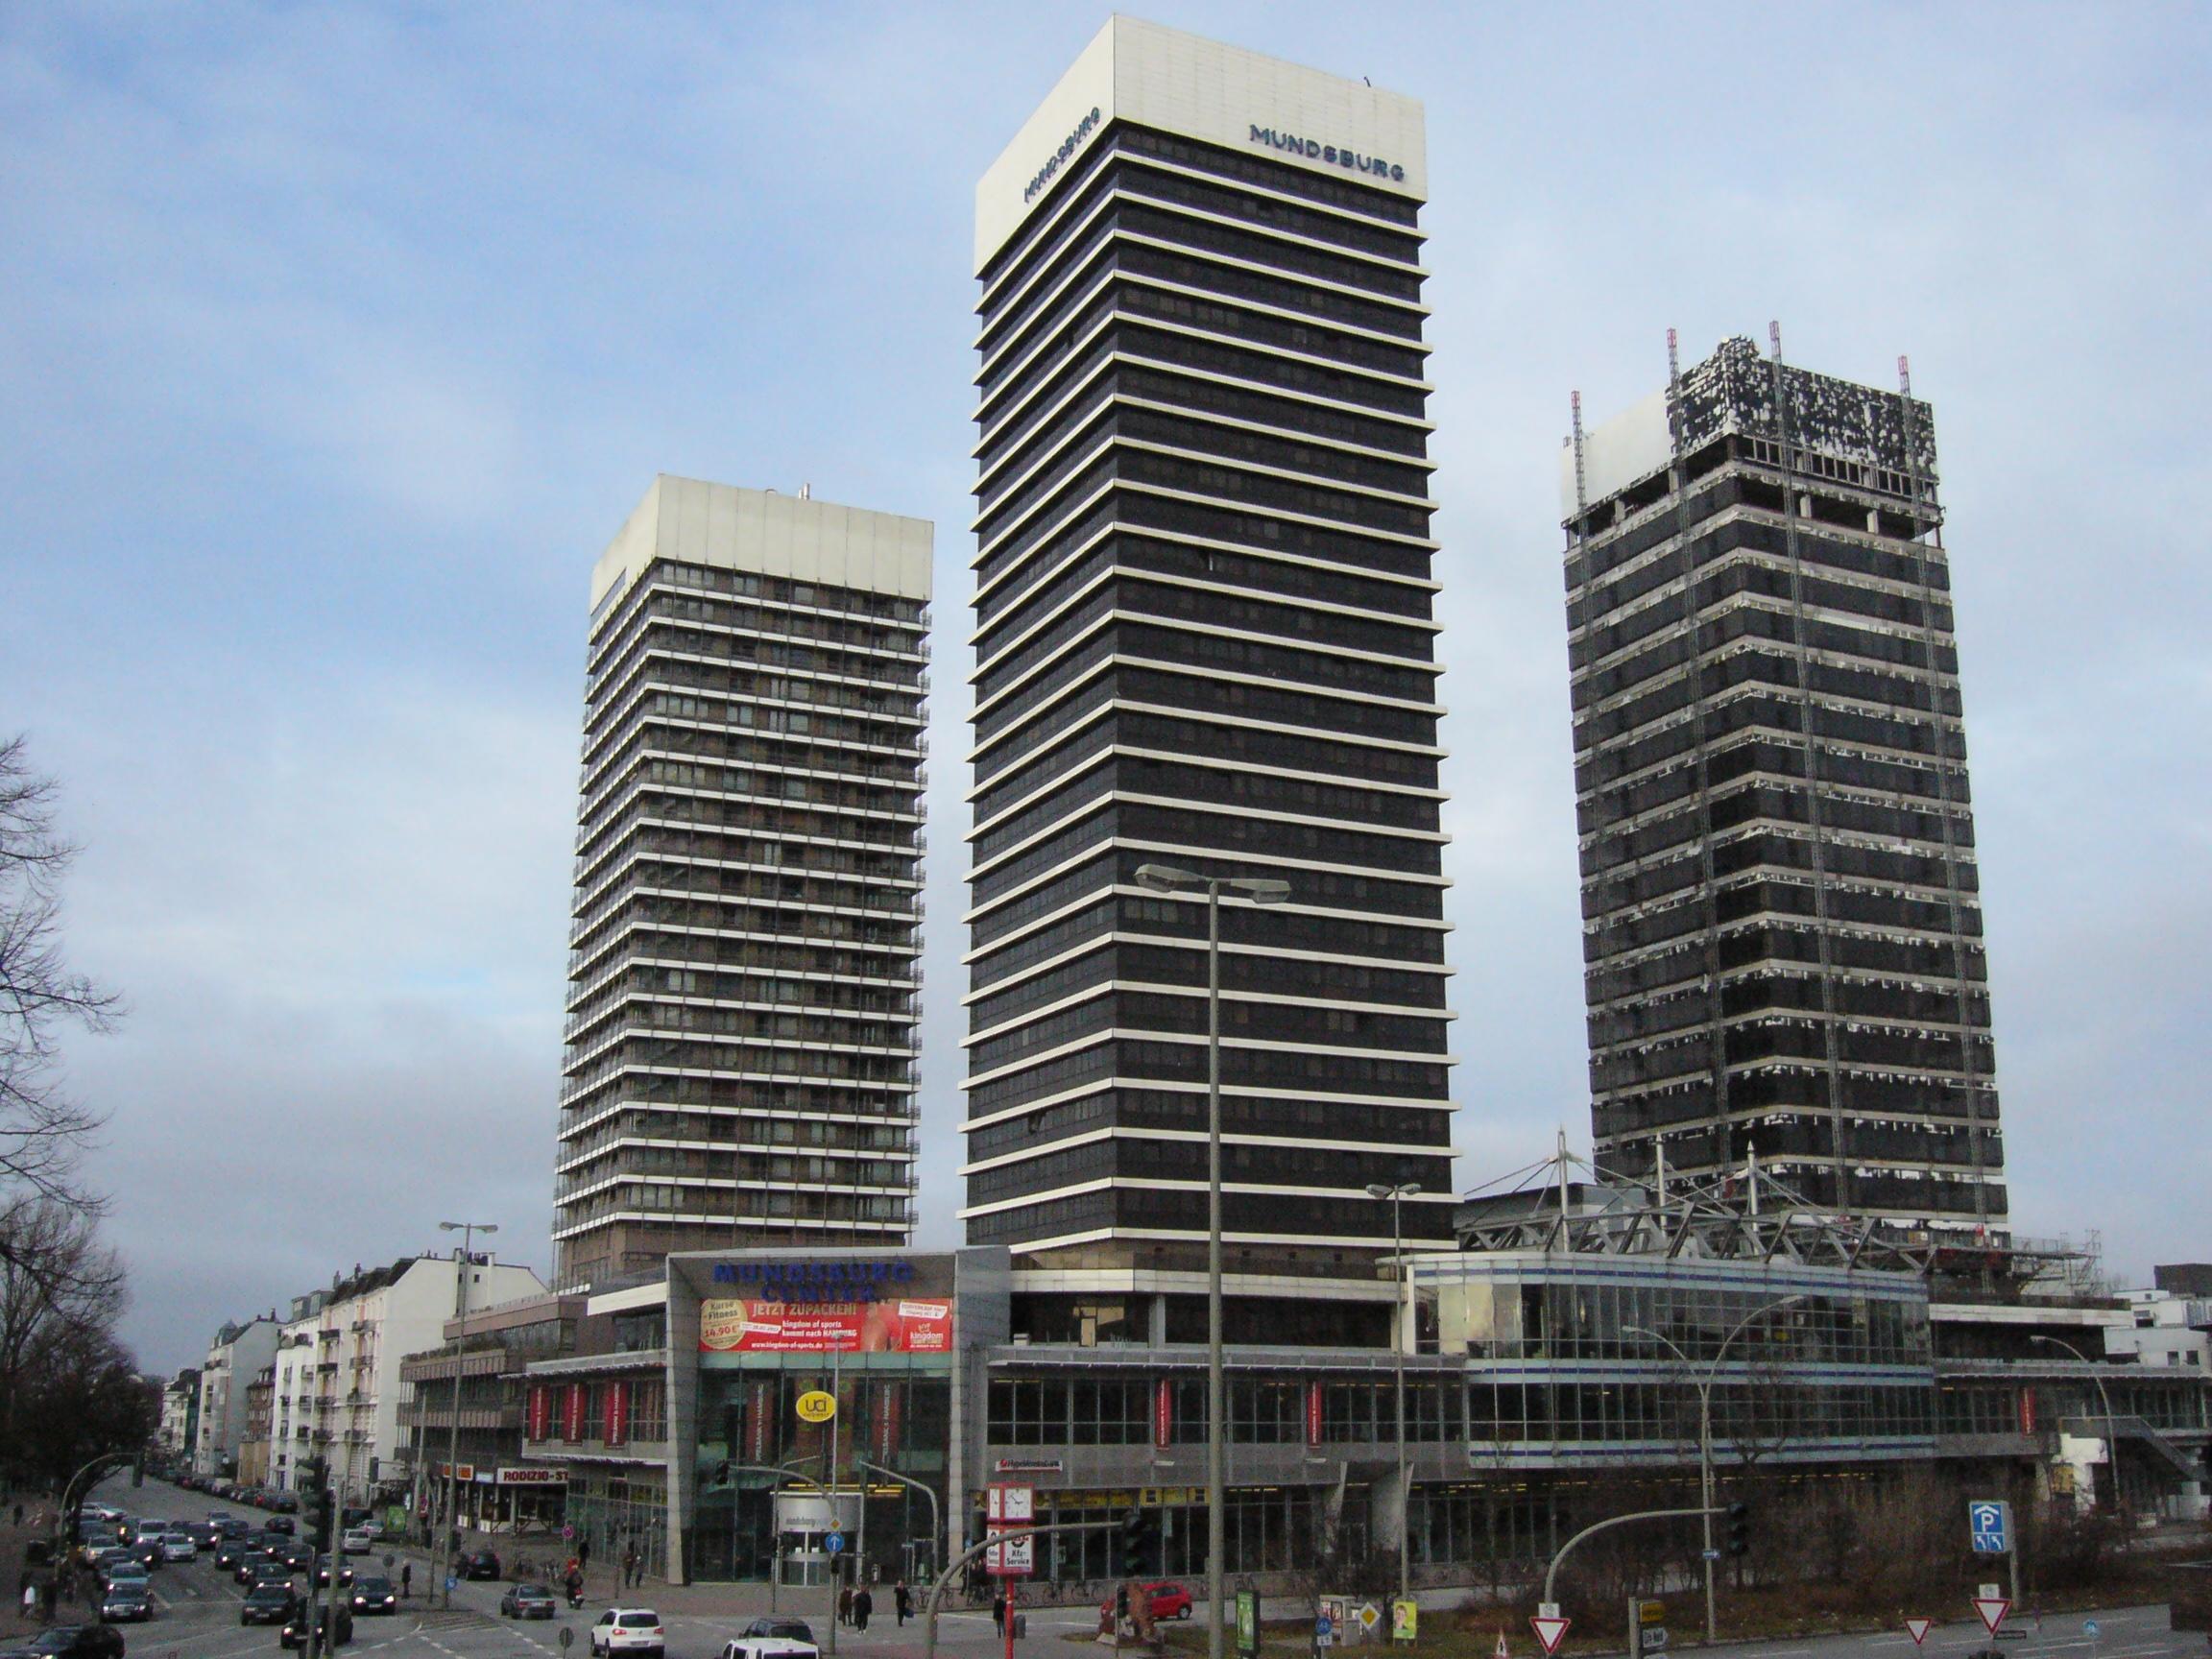 Mundsburg Hamburg